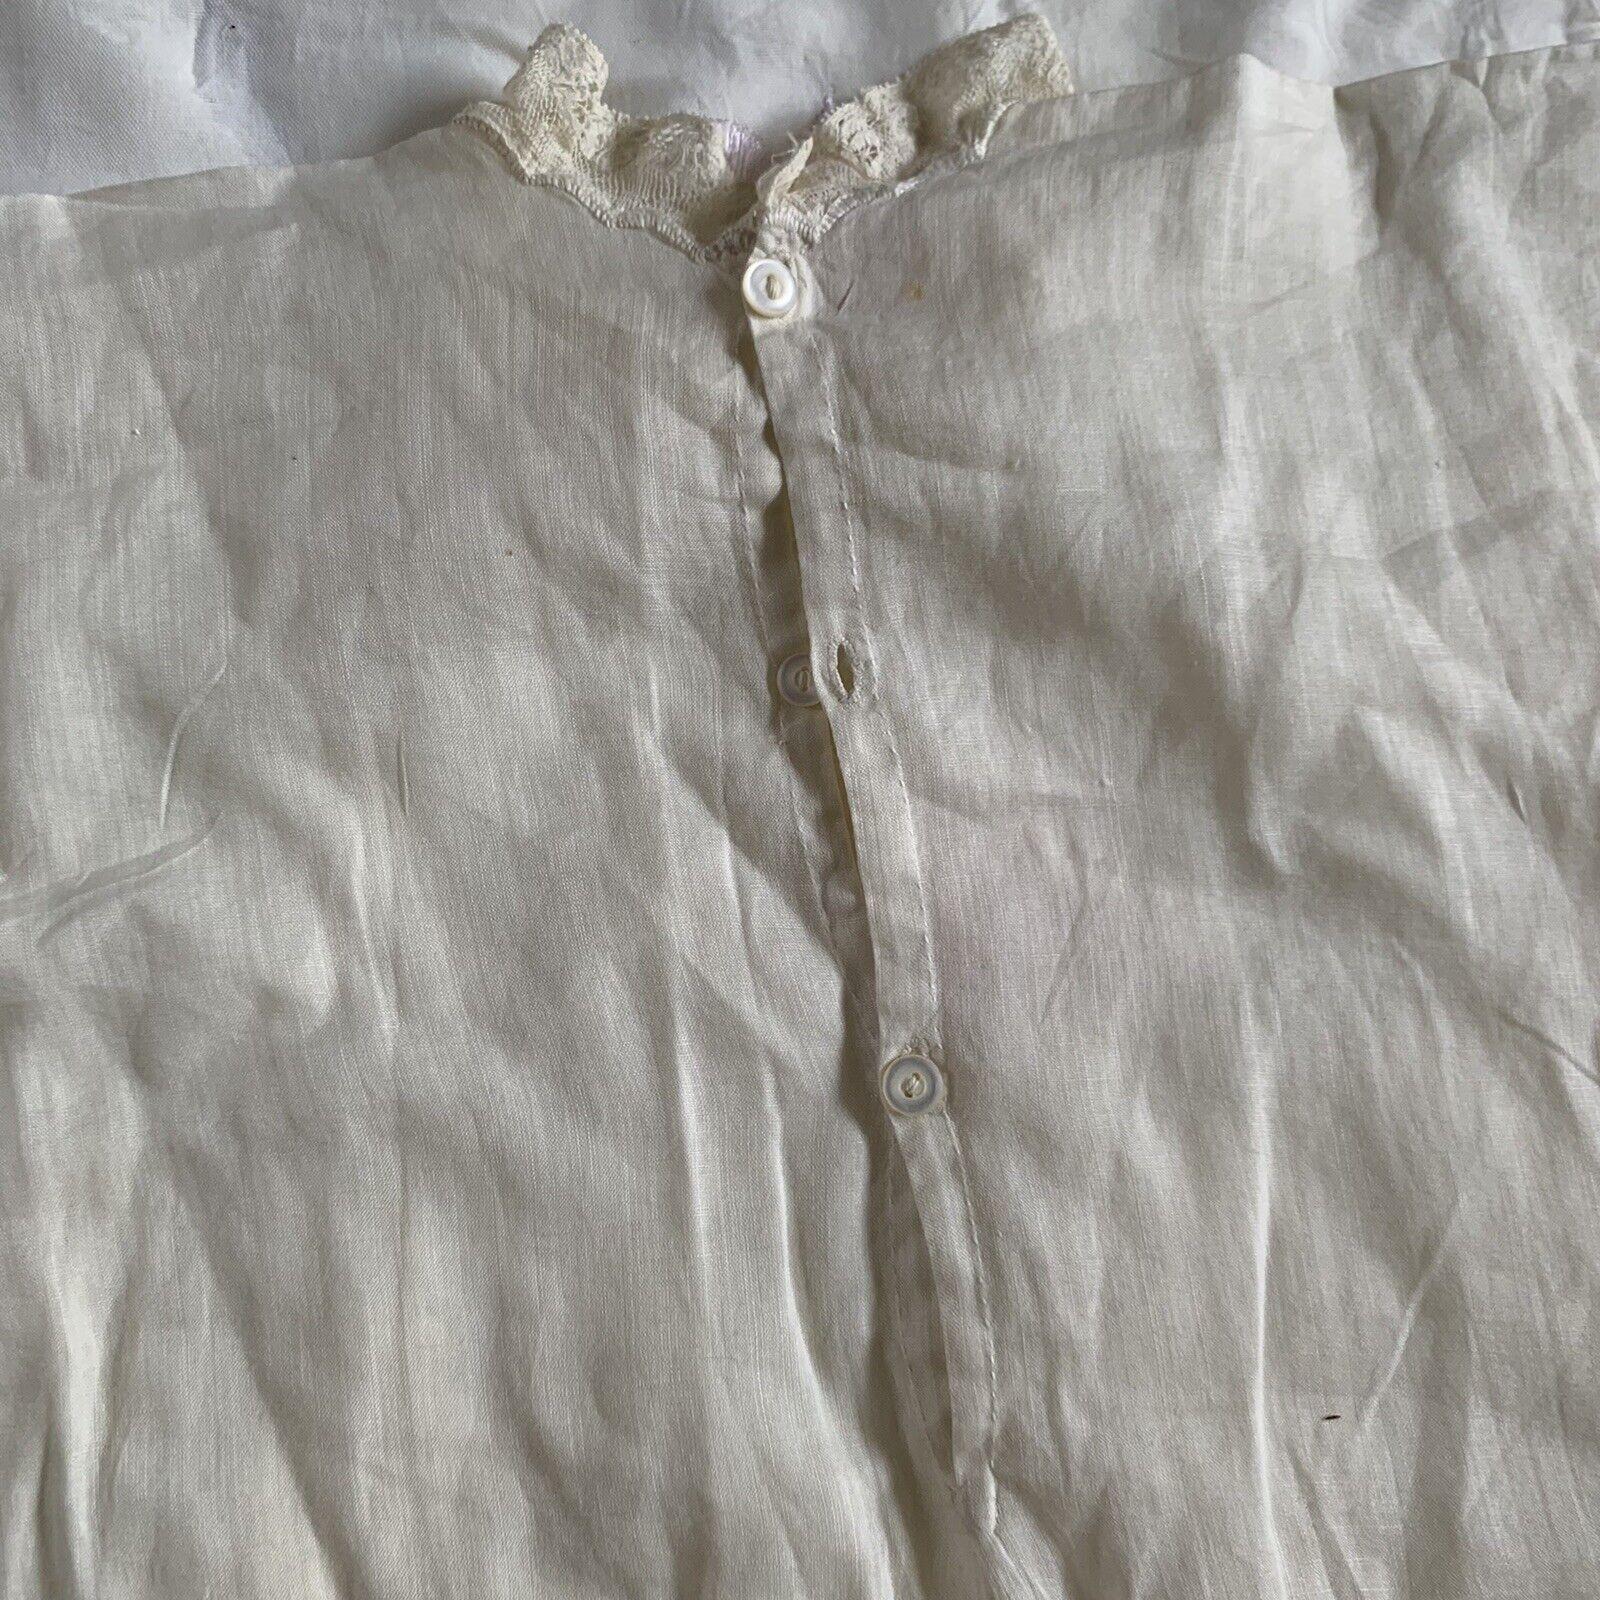 Antique Edwardian Kids Cotton Eyelet Embroidered … - image 12